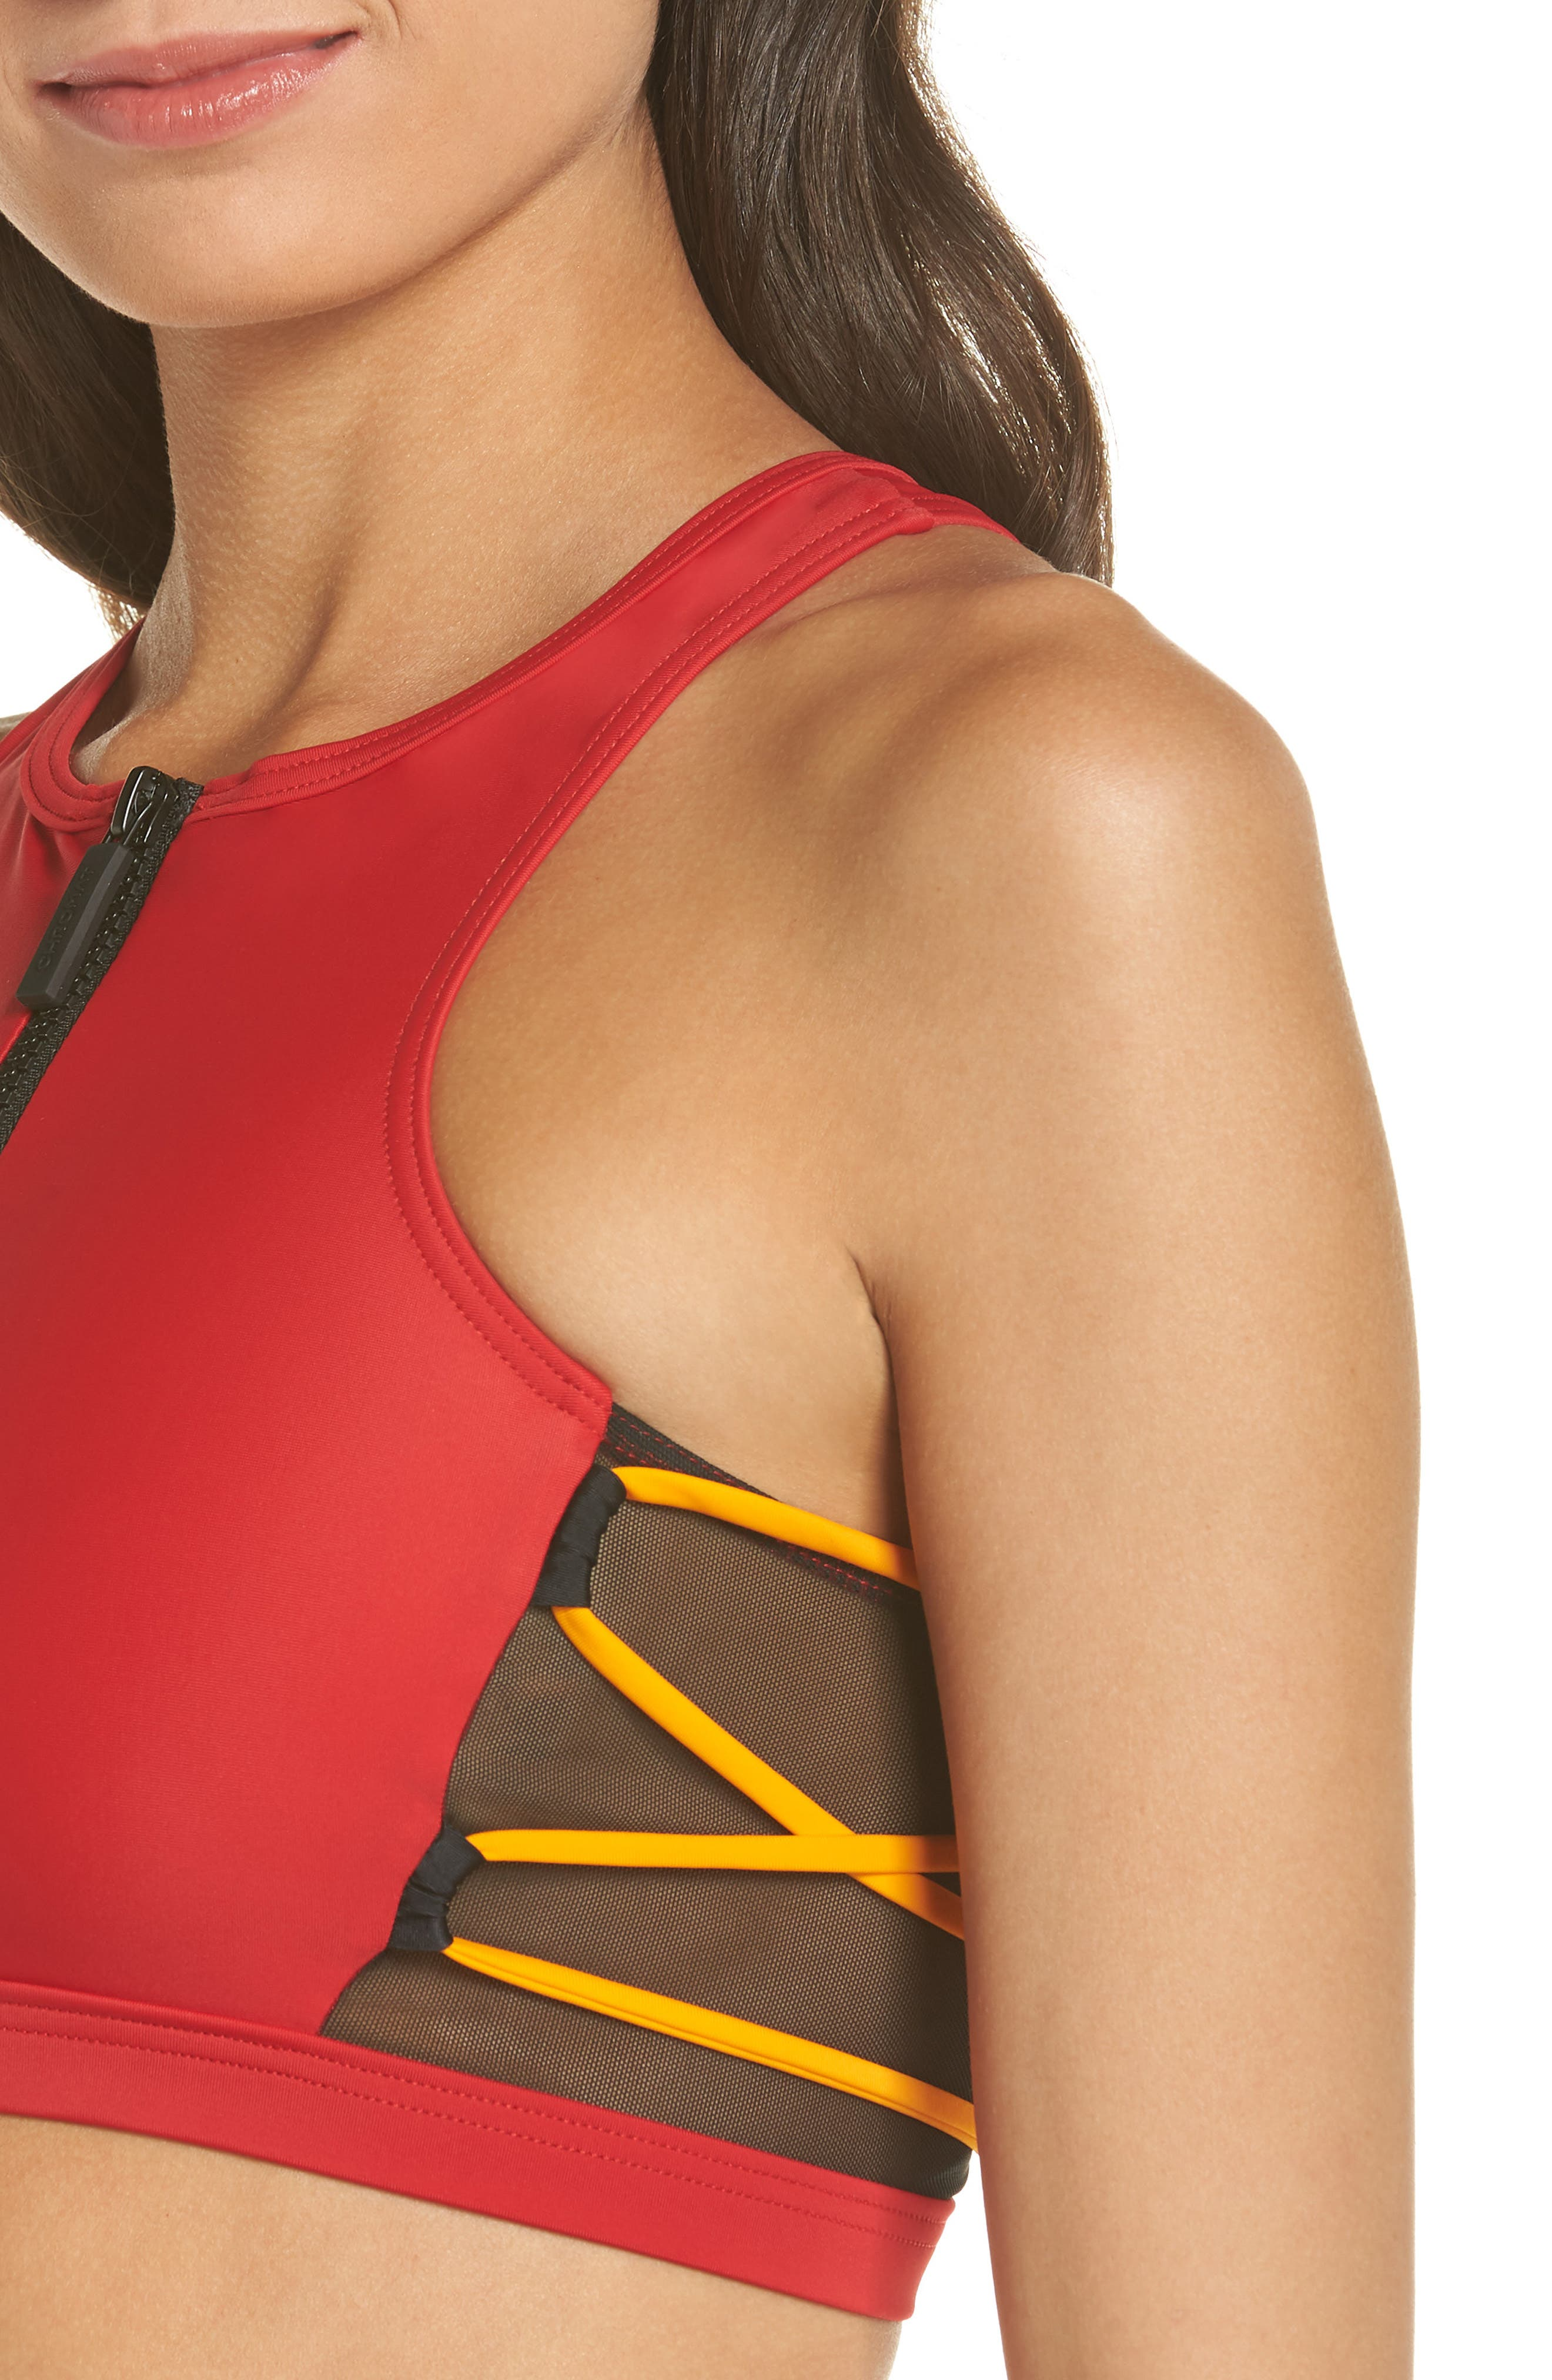 Launch Bikini Top,                             Alternate thumbnail 4, color,                             Red/ Black/ Orange